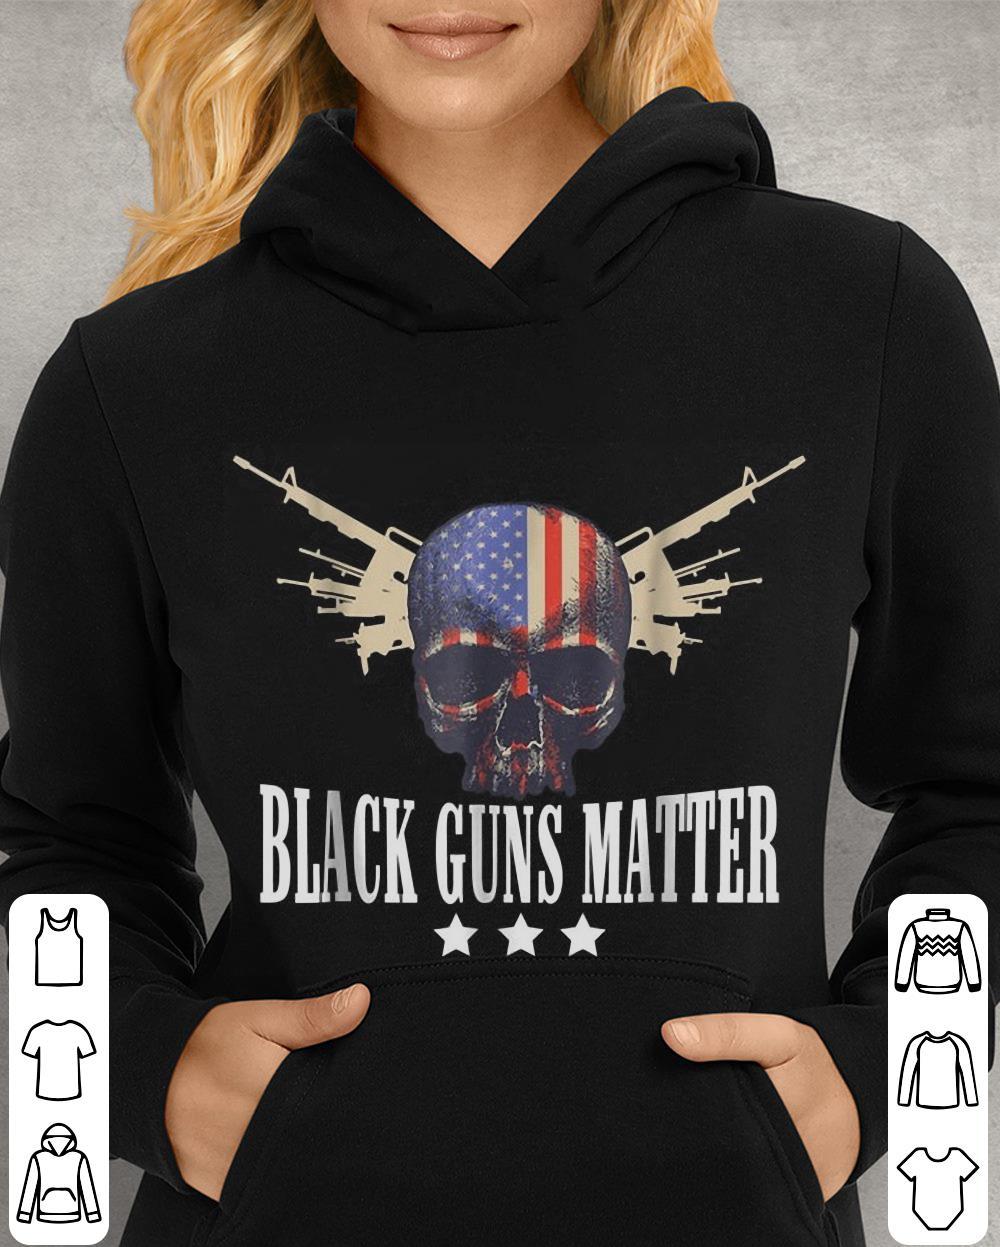 https://unicornshirts.net/images/2018/12/Black-Guns-Matter-American-Flag-Skull-Three-Stars-shirt_4.jpg